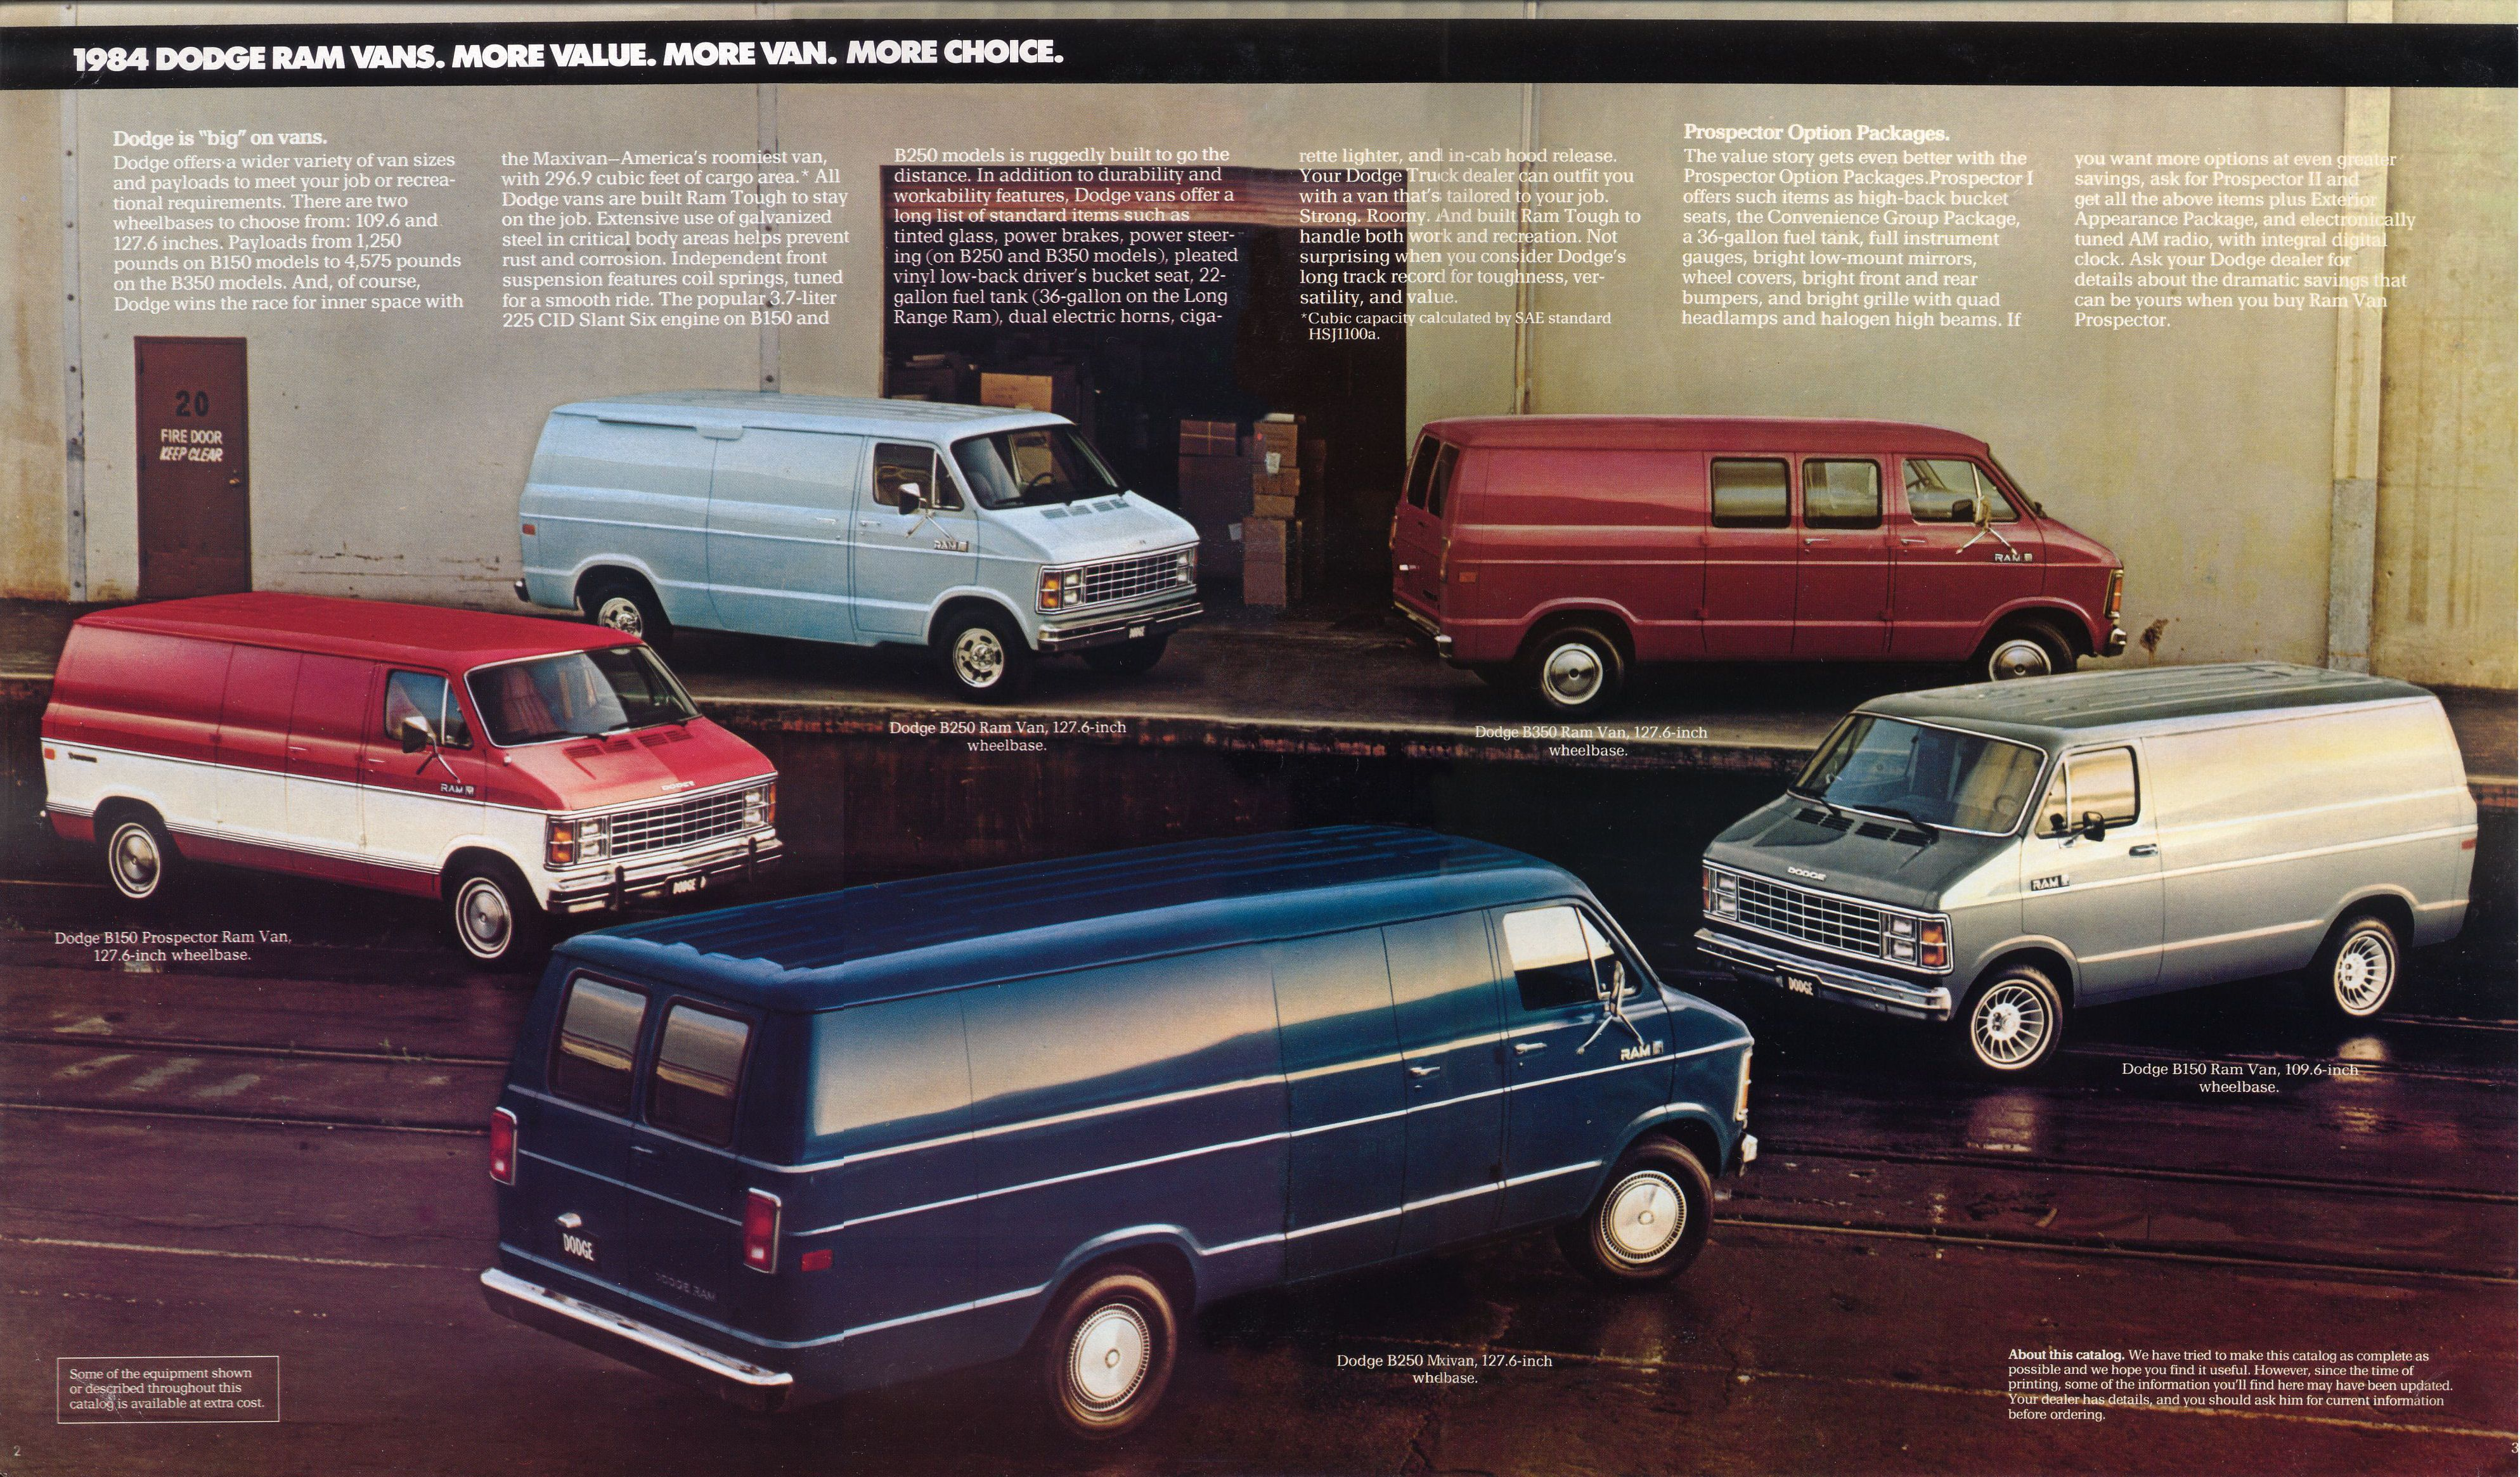 Old Dodge Ram >> 1984 Dodge Ram brochure